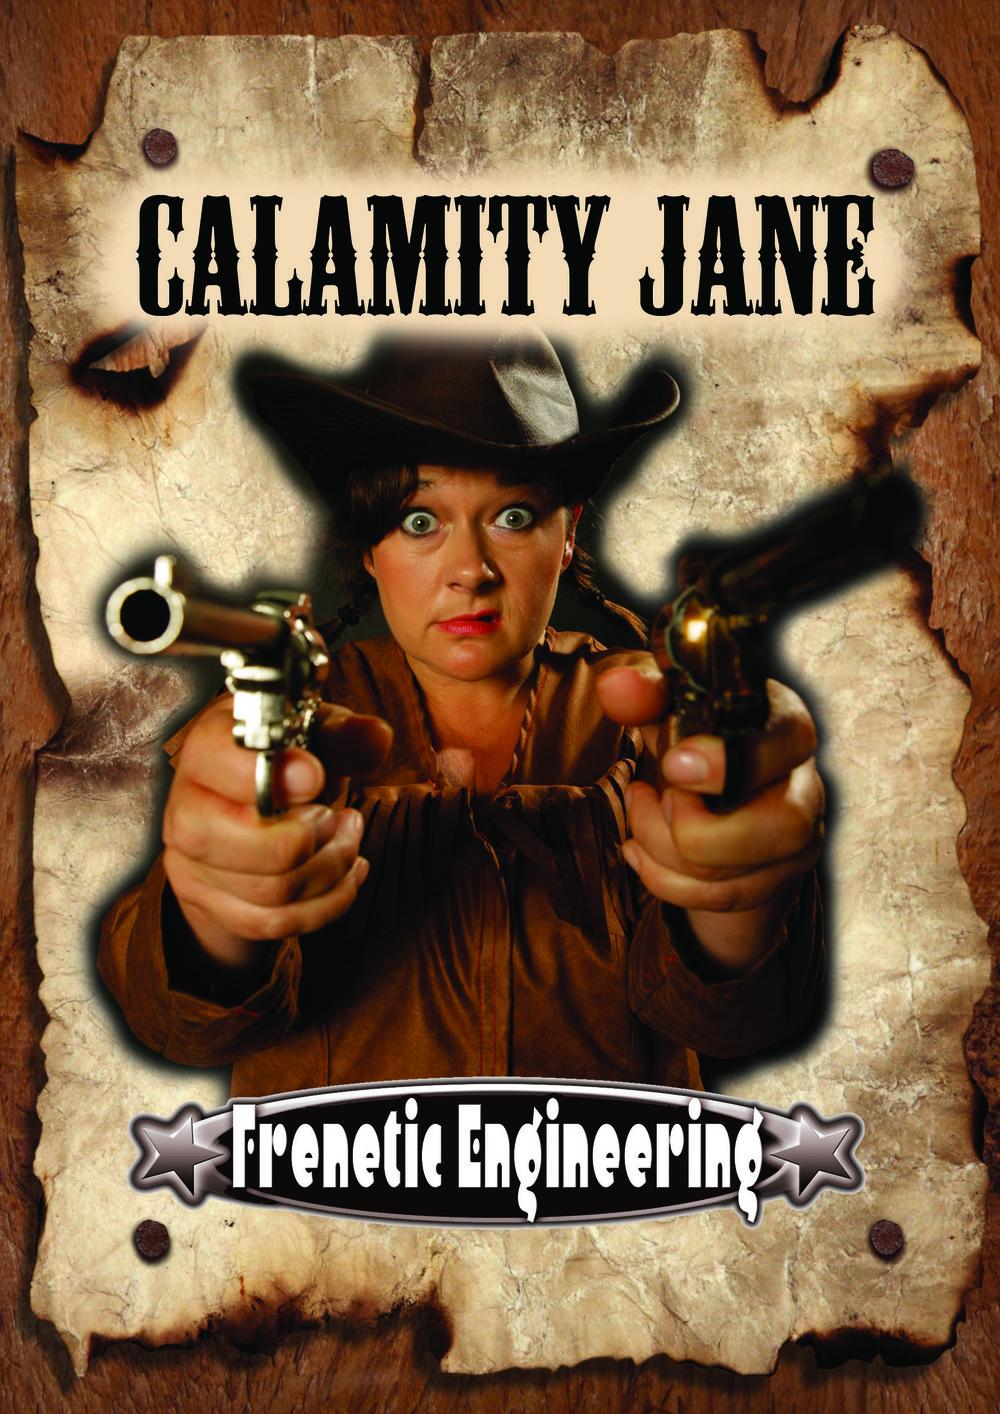 Calamity-Jane_gun_nocontact-copy.jpg